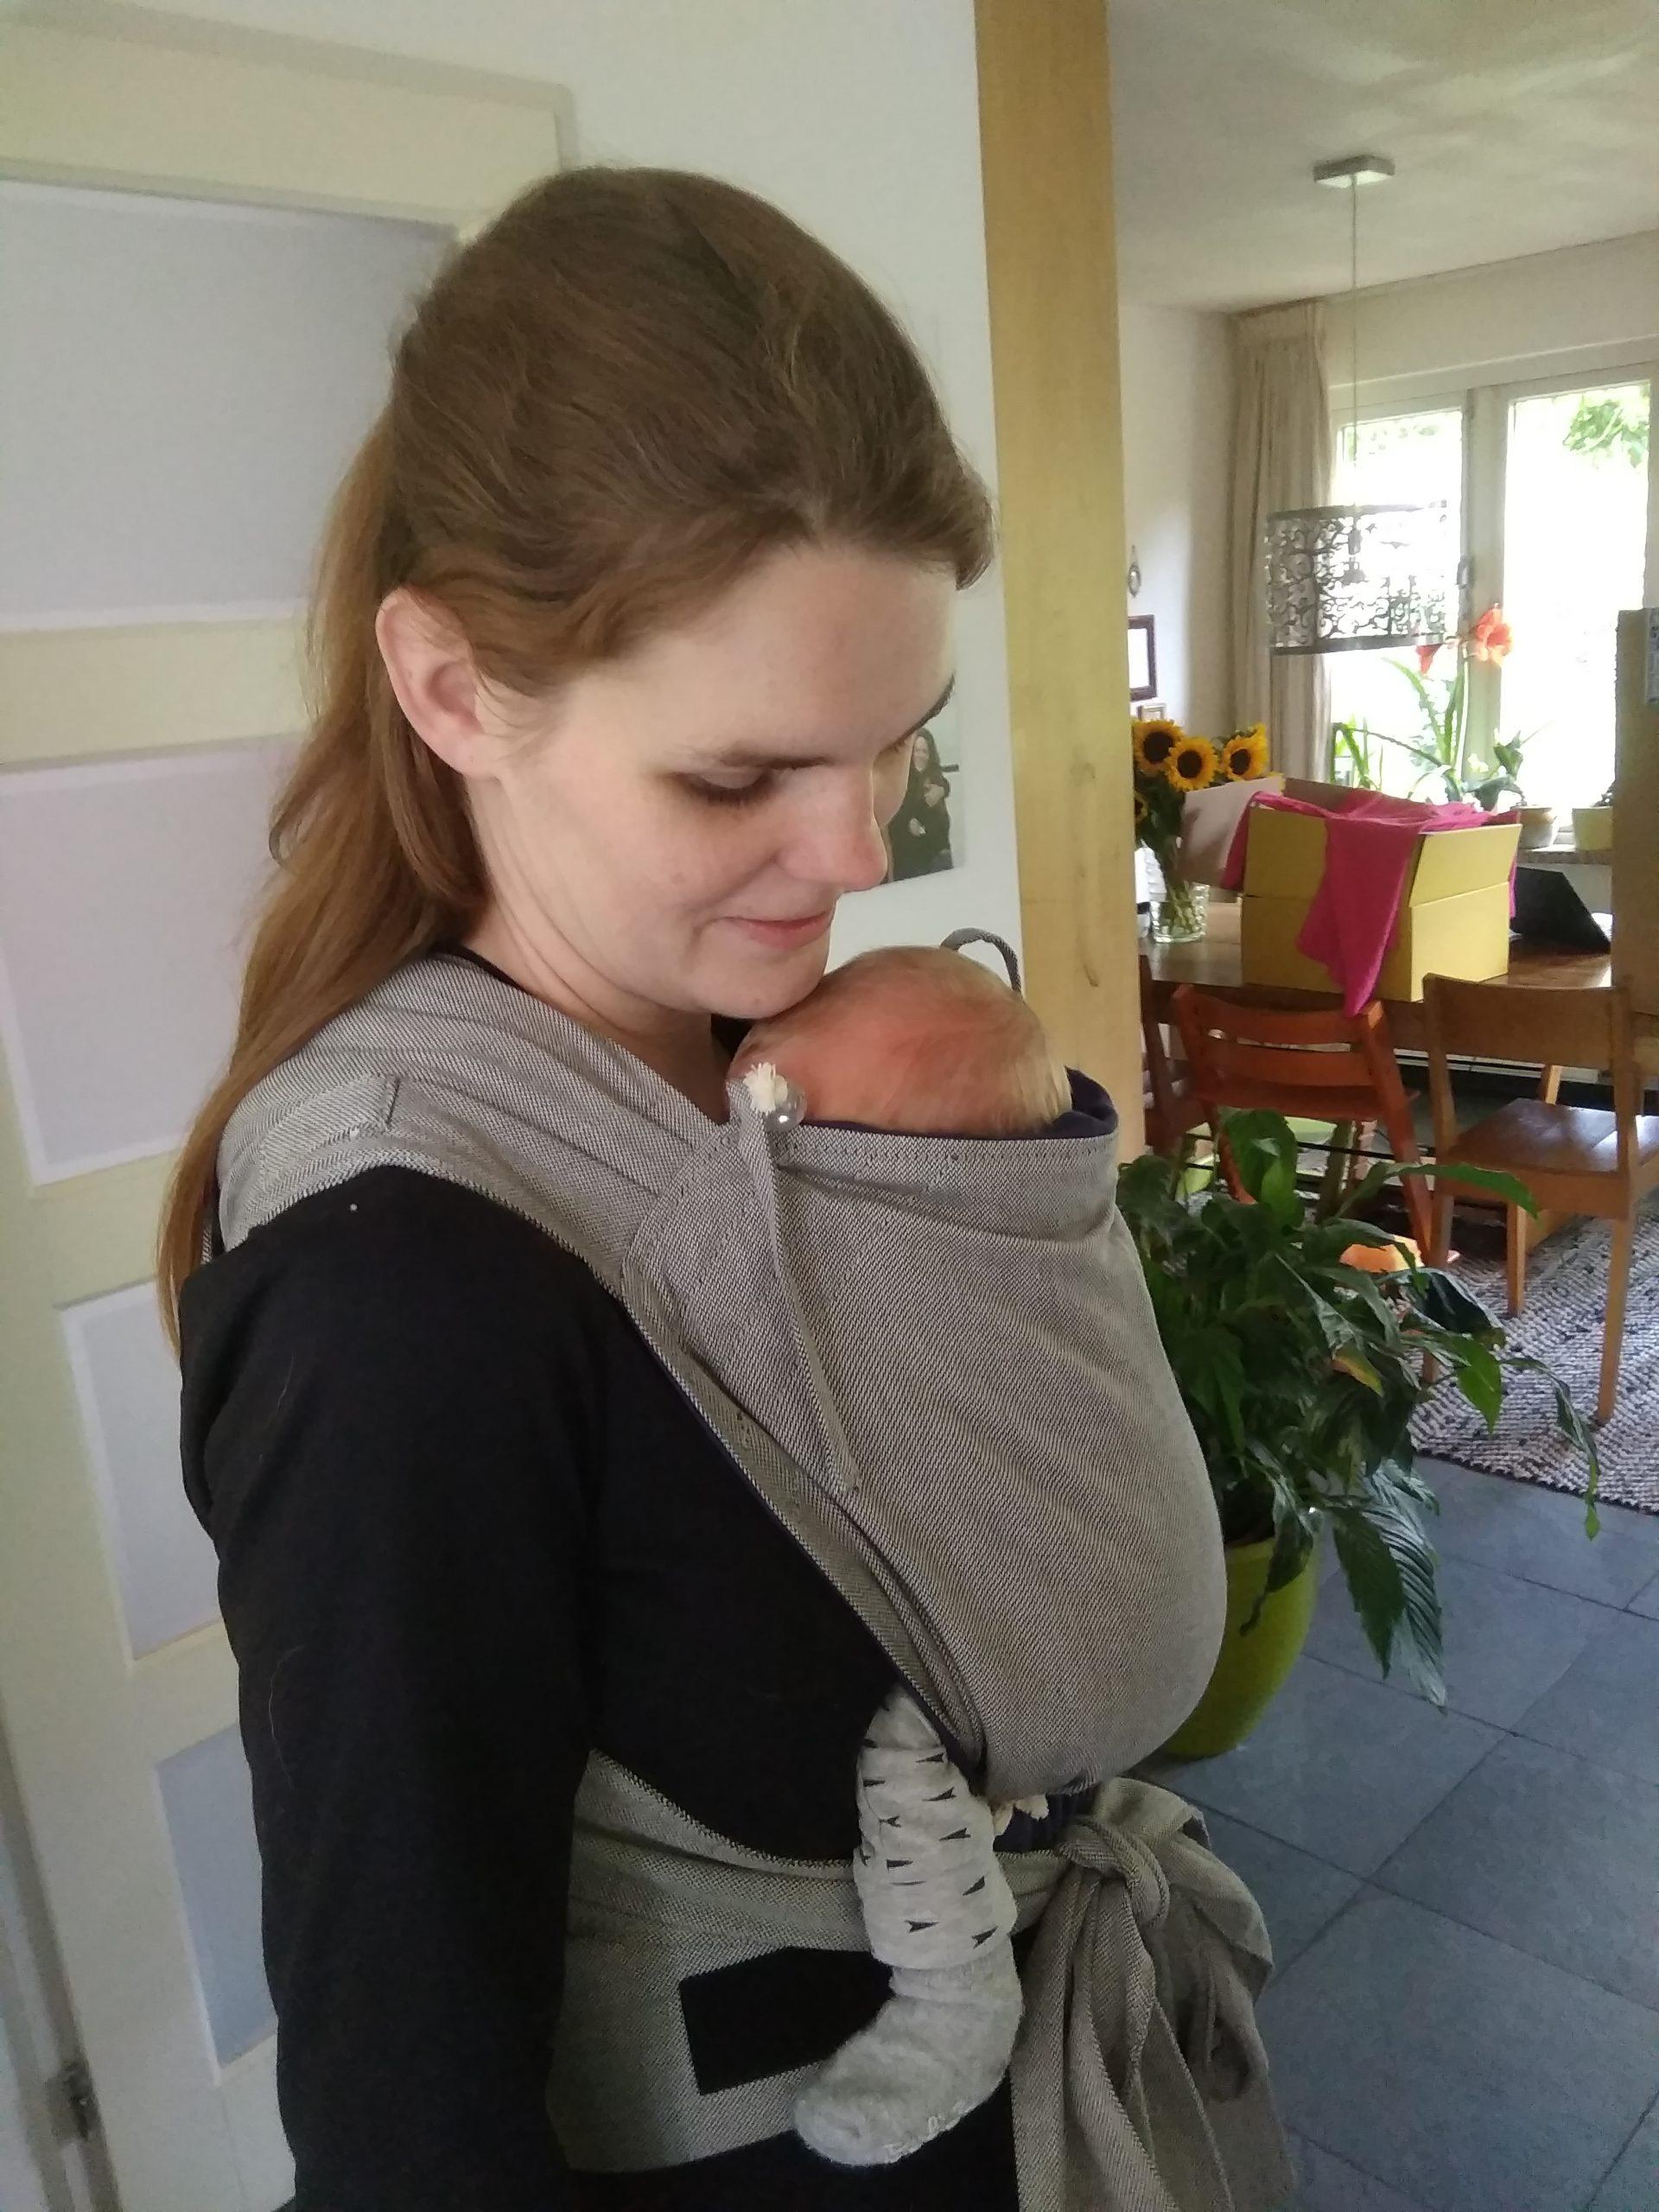 LImas baby 3 kg newborn